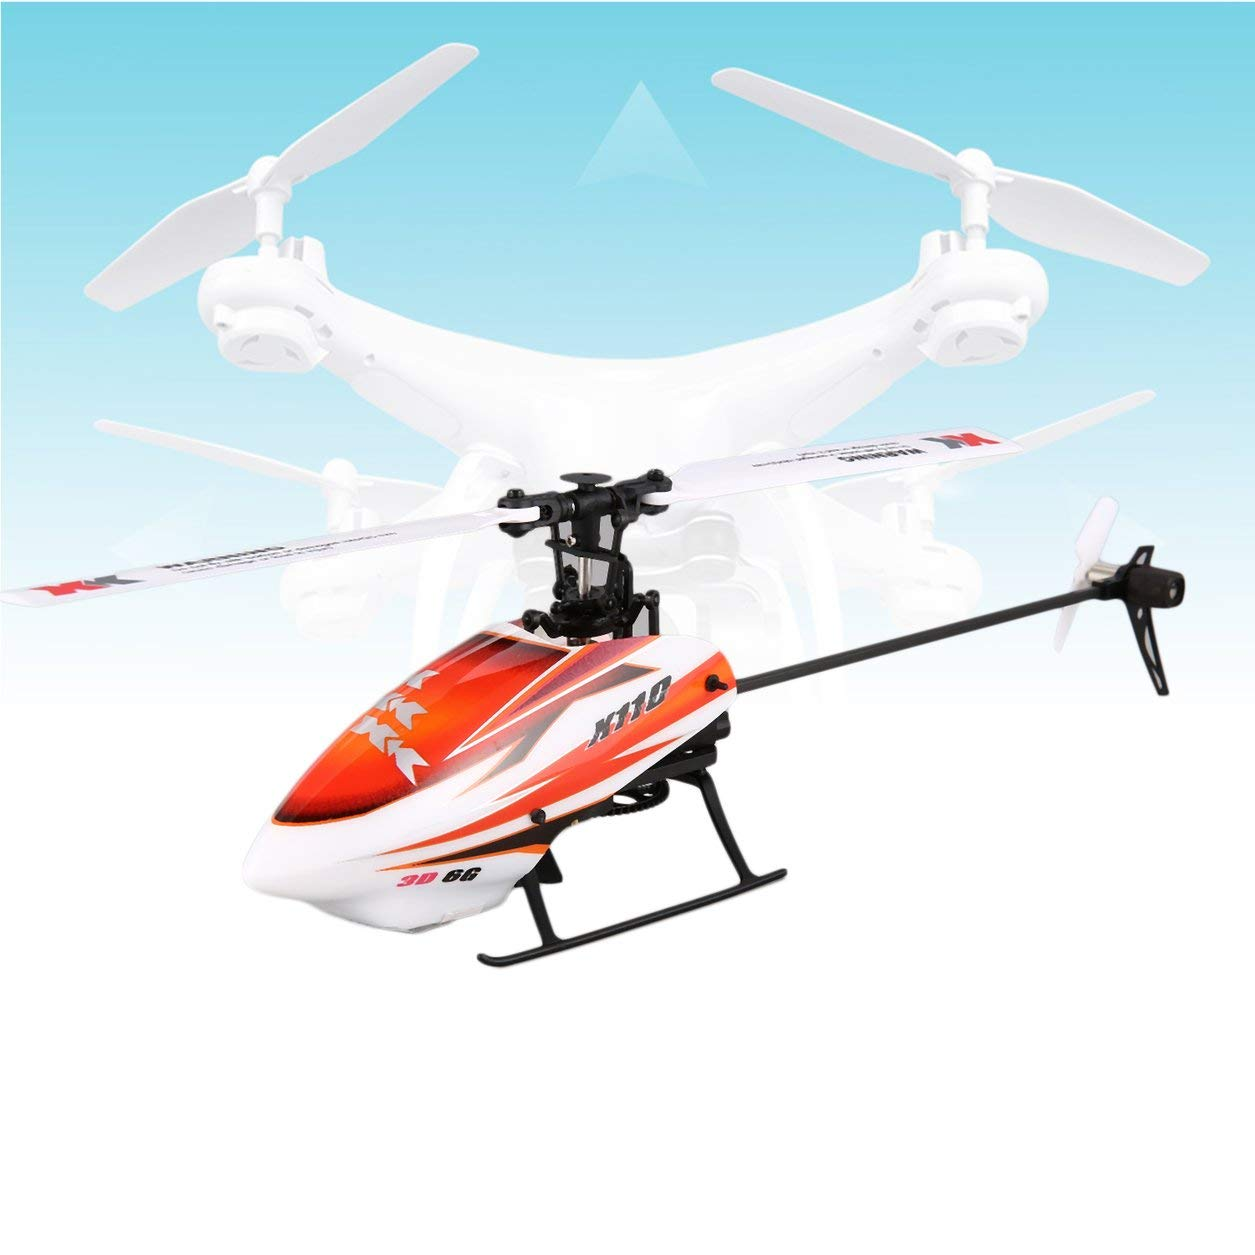 Dailyinshop XK K110 6CH 3D-6G-System Mini Brushless RC Hubschrauber-Drohne mit Gyro RTF